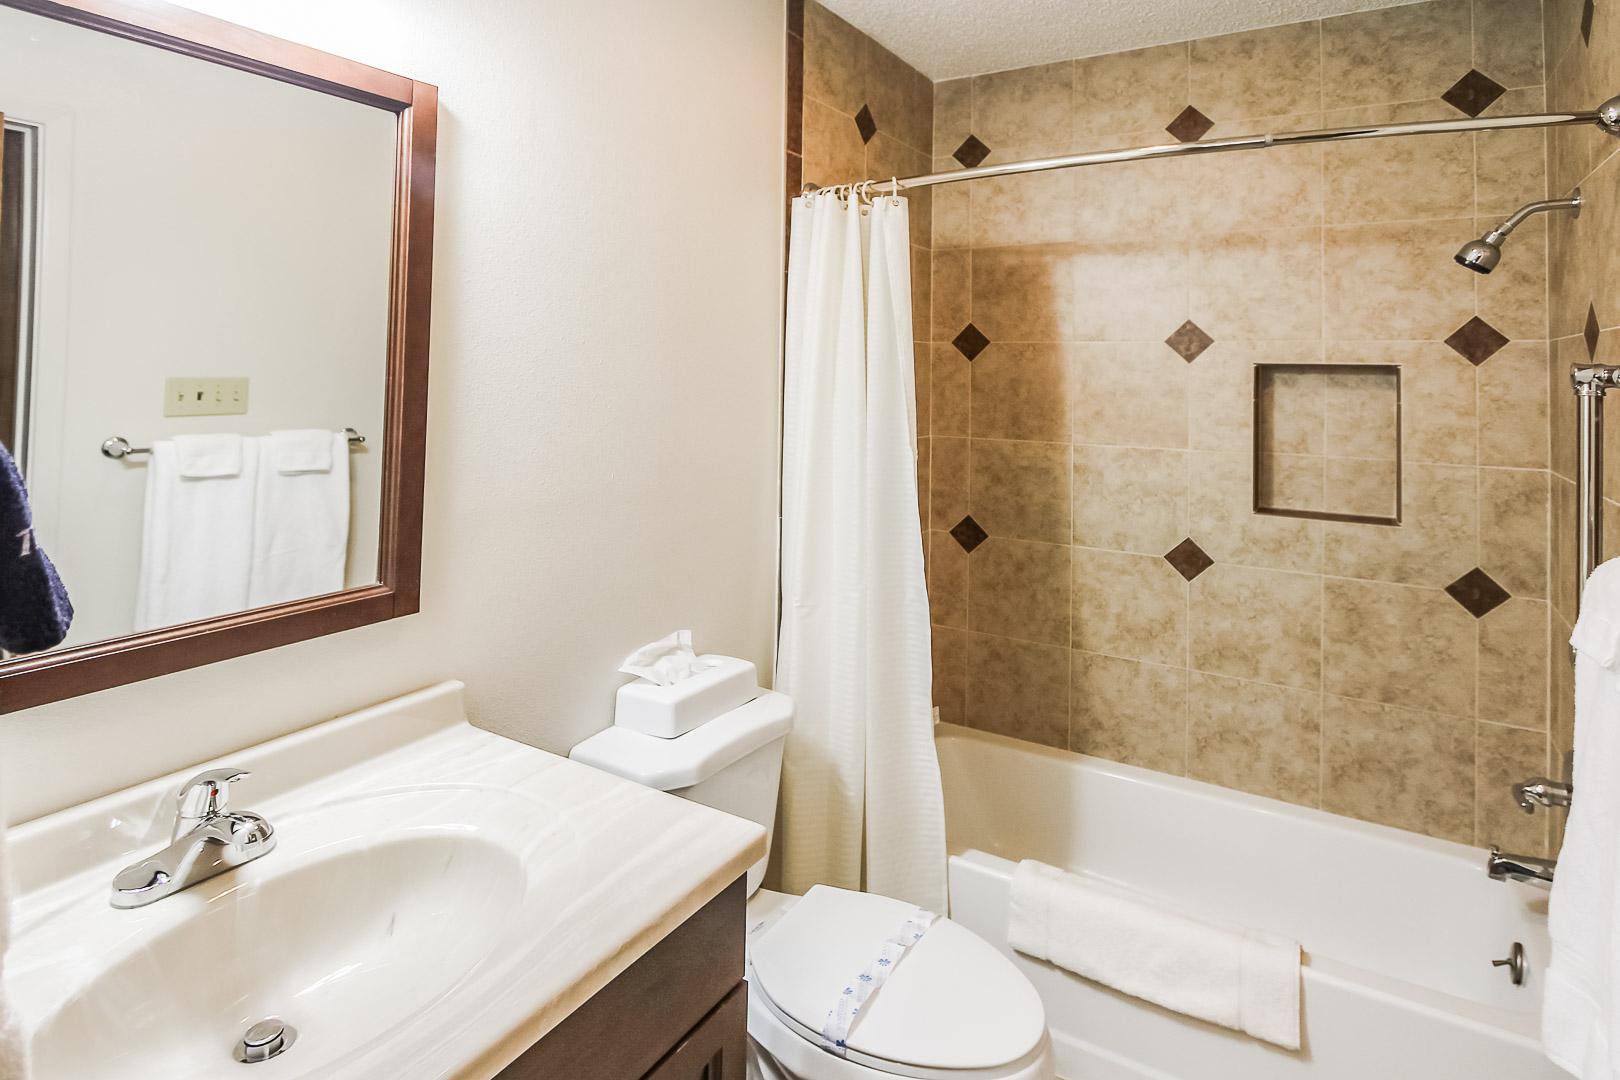 Shores at Lake Travis - Unit Amenities - Bathroom